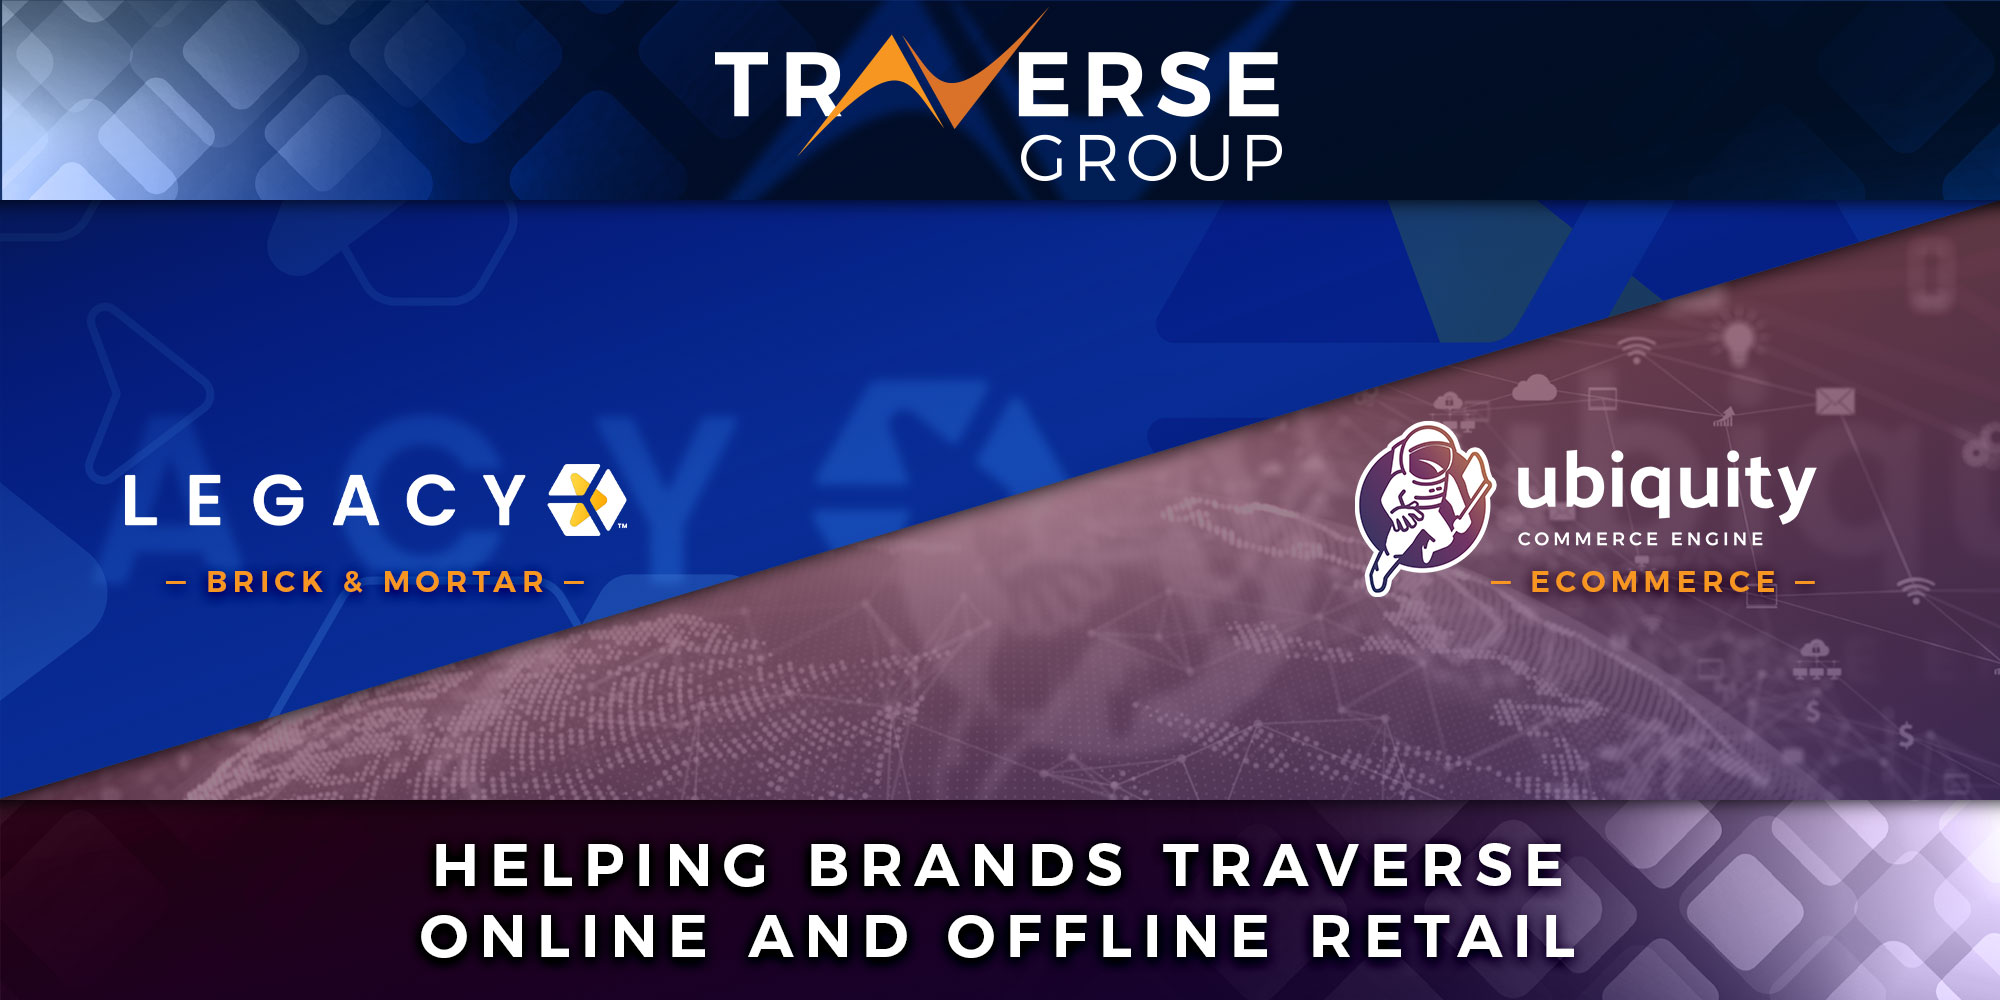 Traverse Group